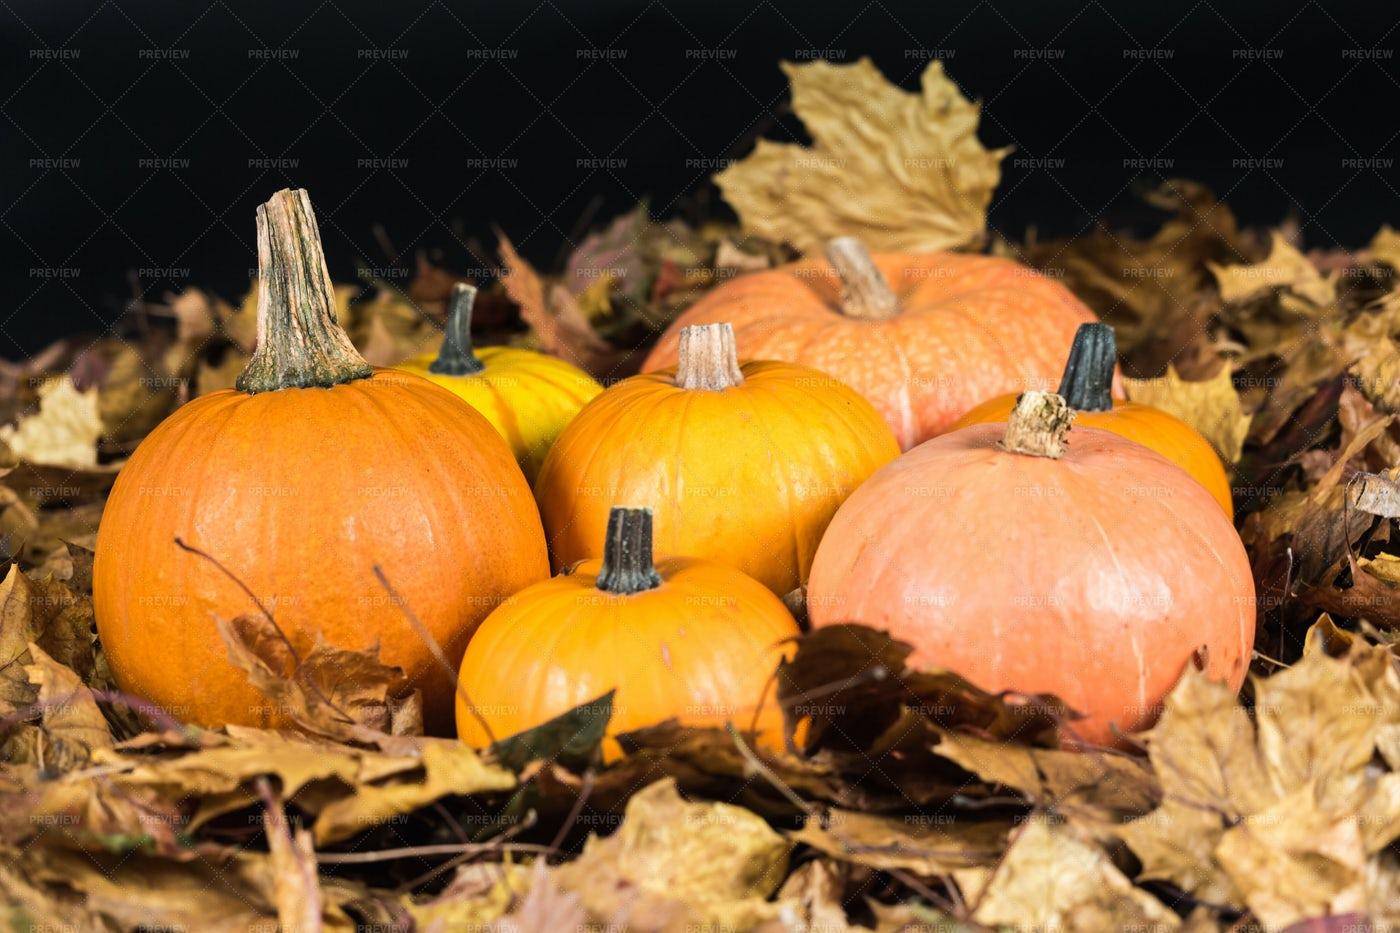 Autumn Pumpkins On Oak Leaves: Stock Photos